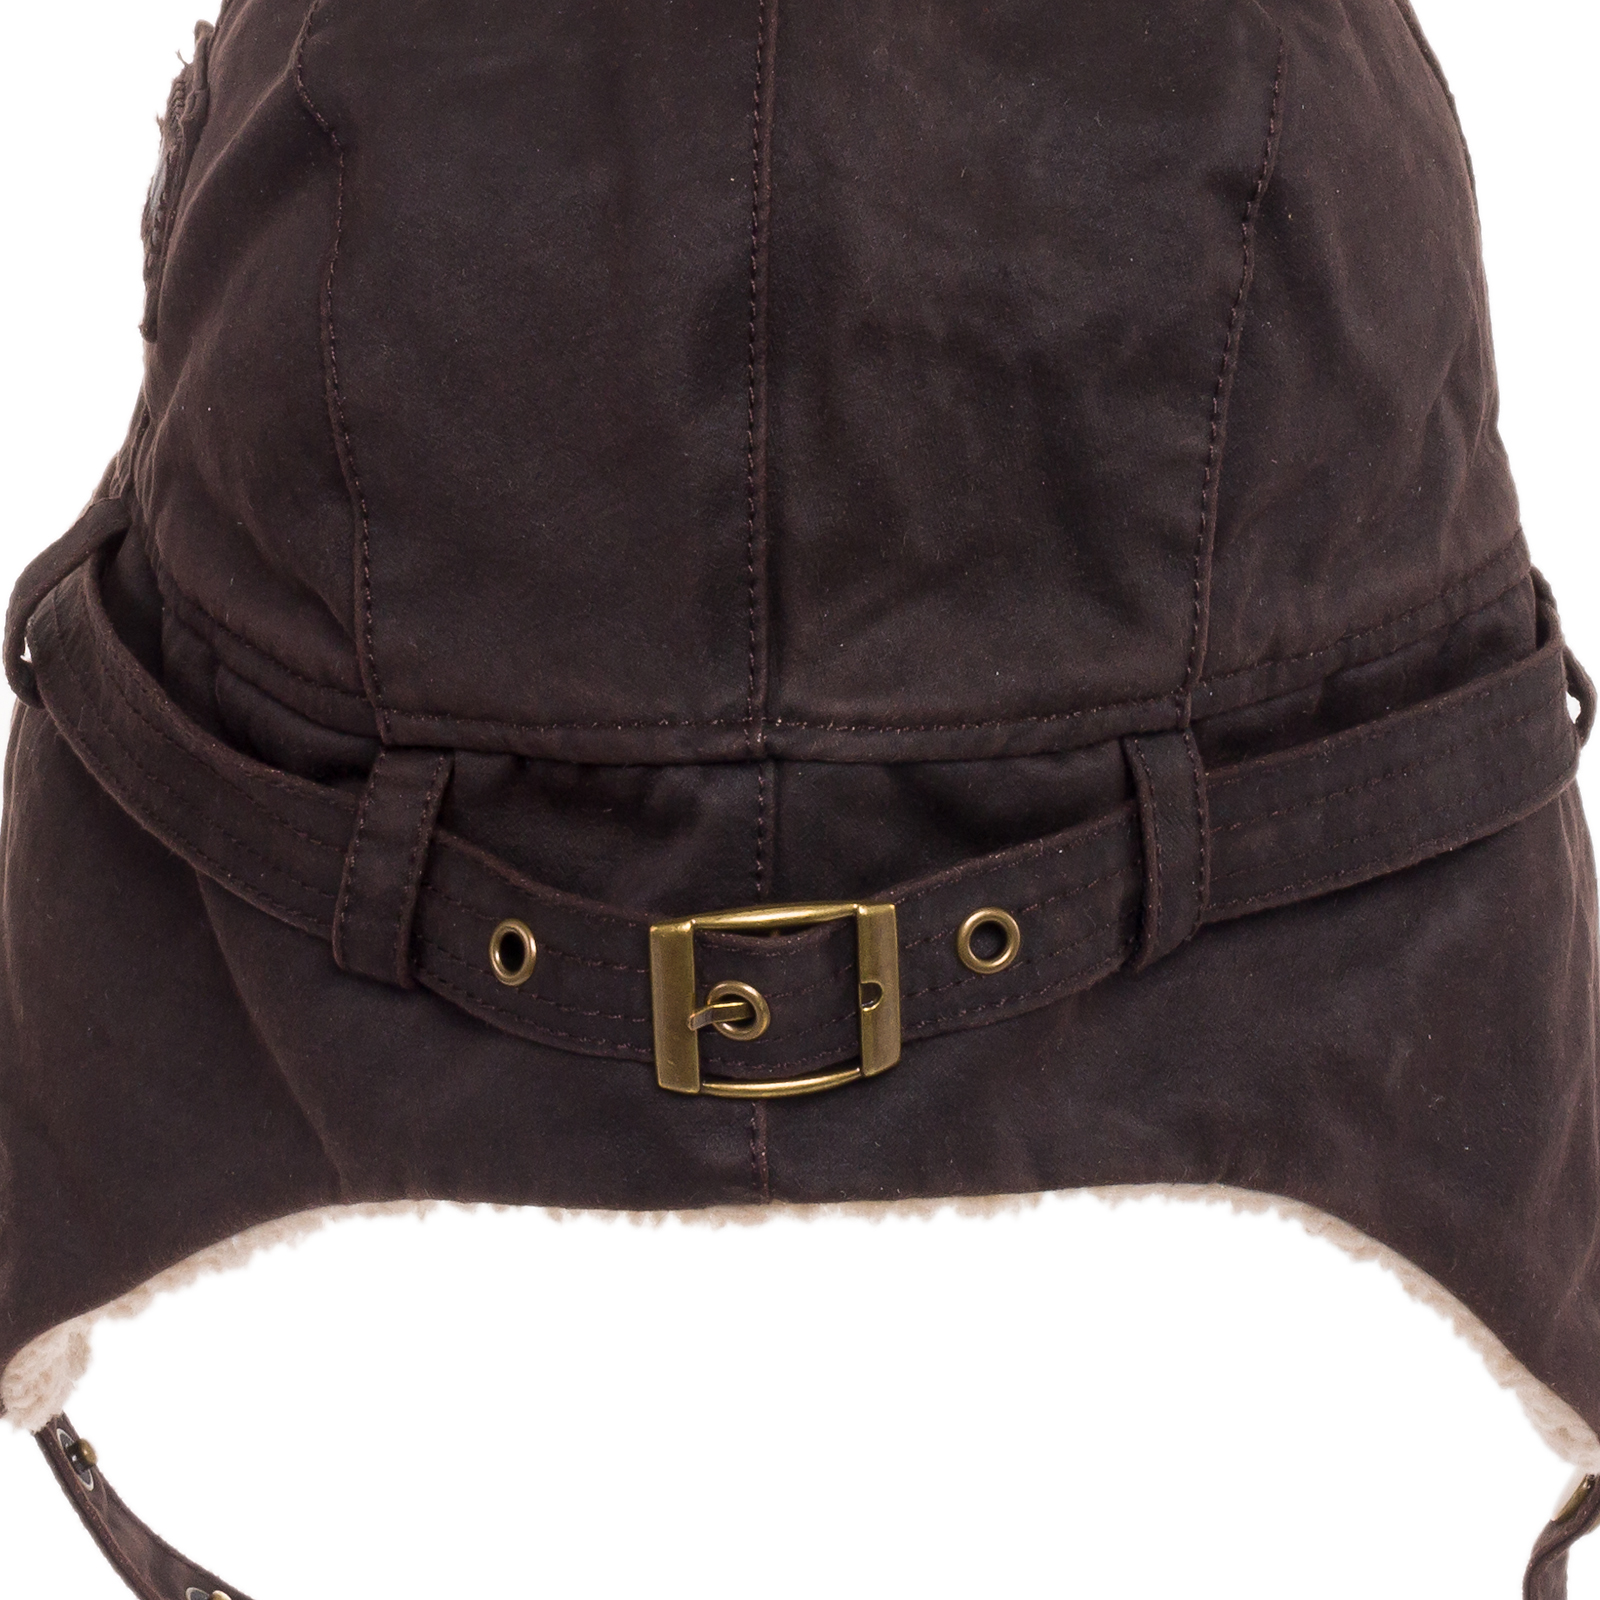 Broner Hats: Broner Mens Automatic Pilot Aviator Trapper Bomber Cap Hat